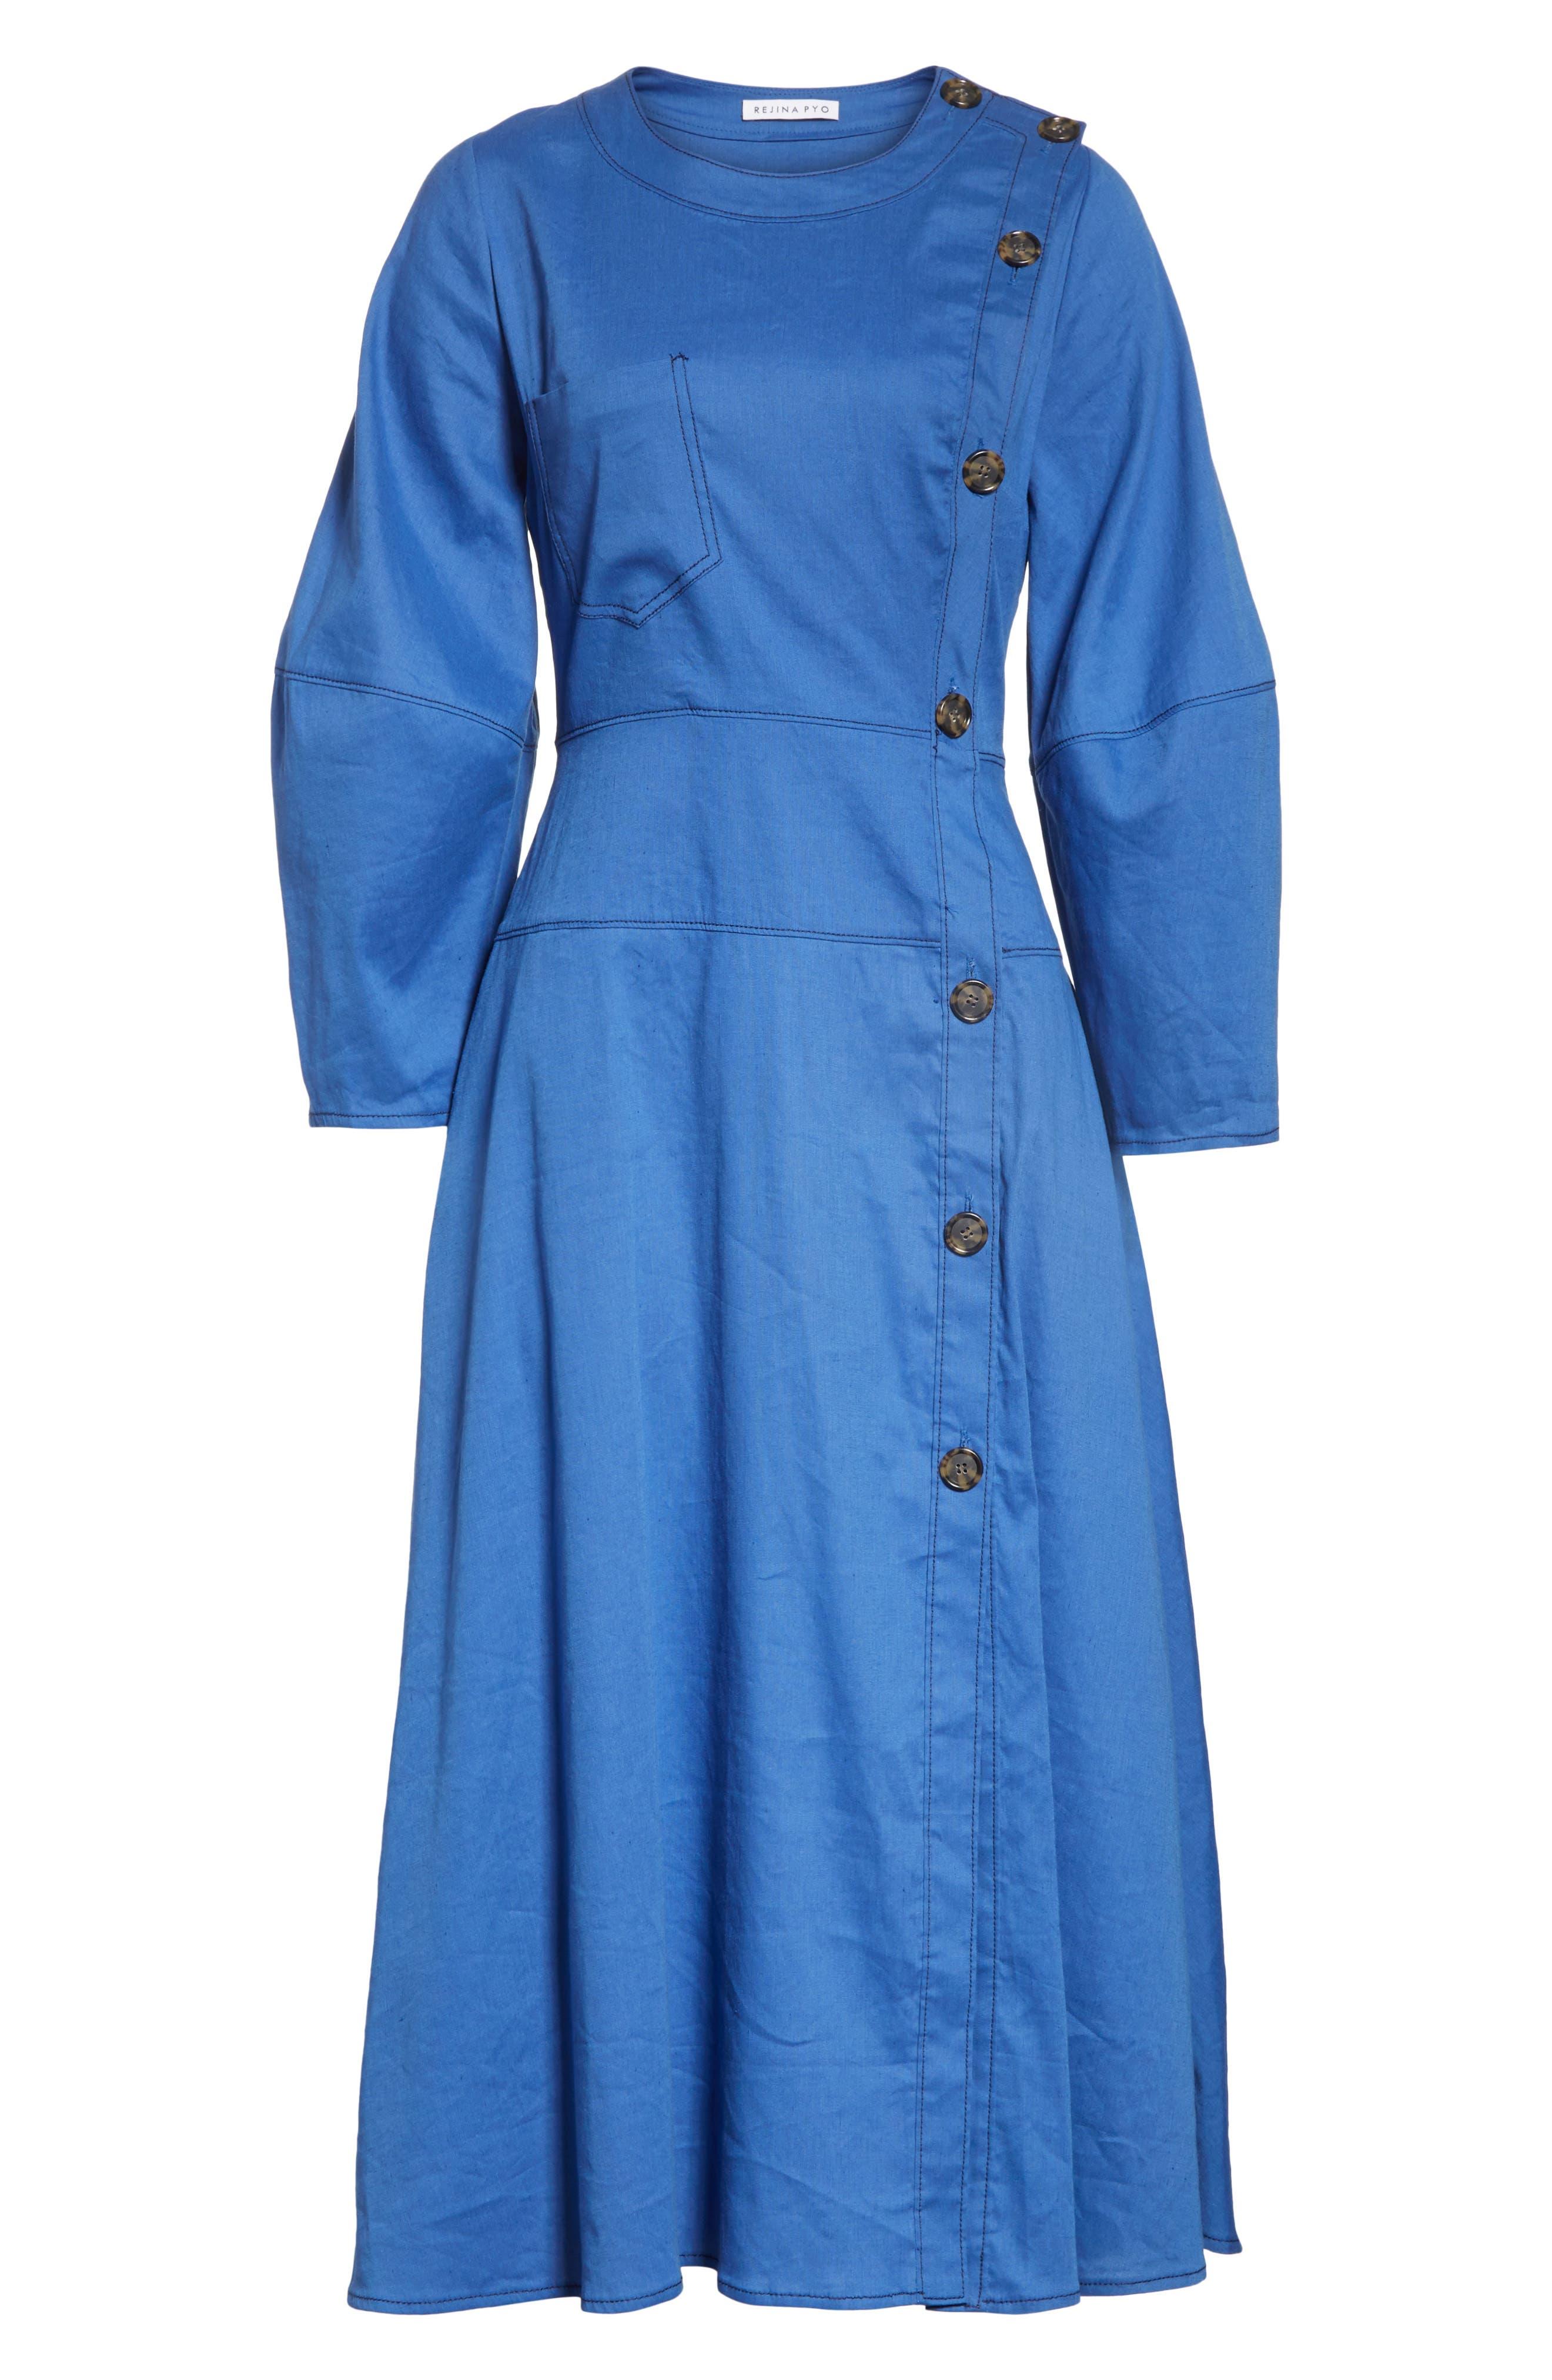 Michaela Linen Dress,                             Alternate thumbnail 6, color,                             Linen Blue